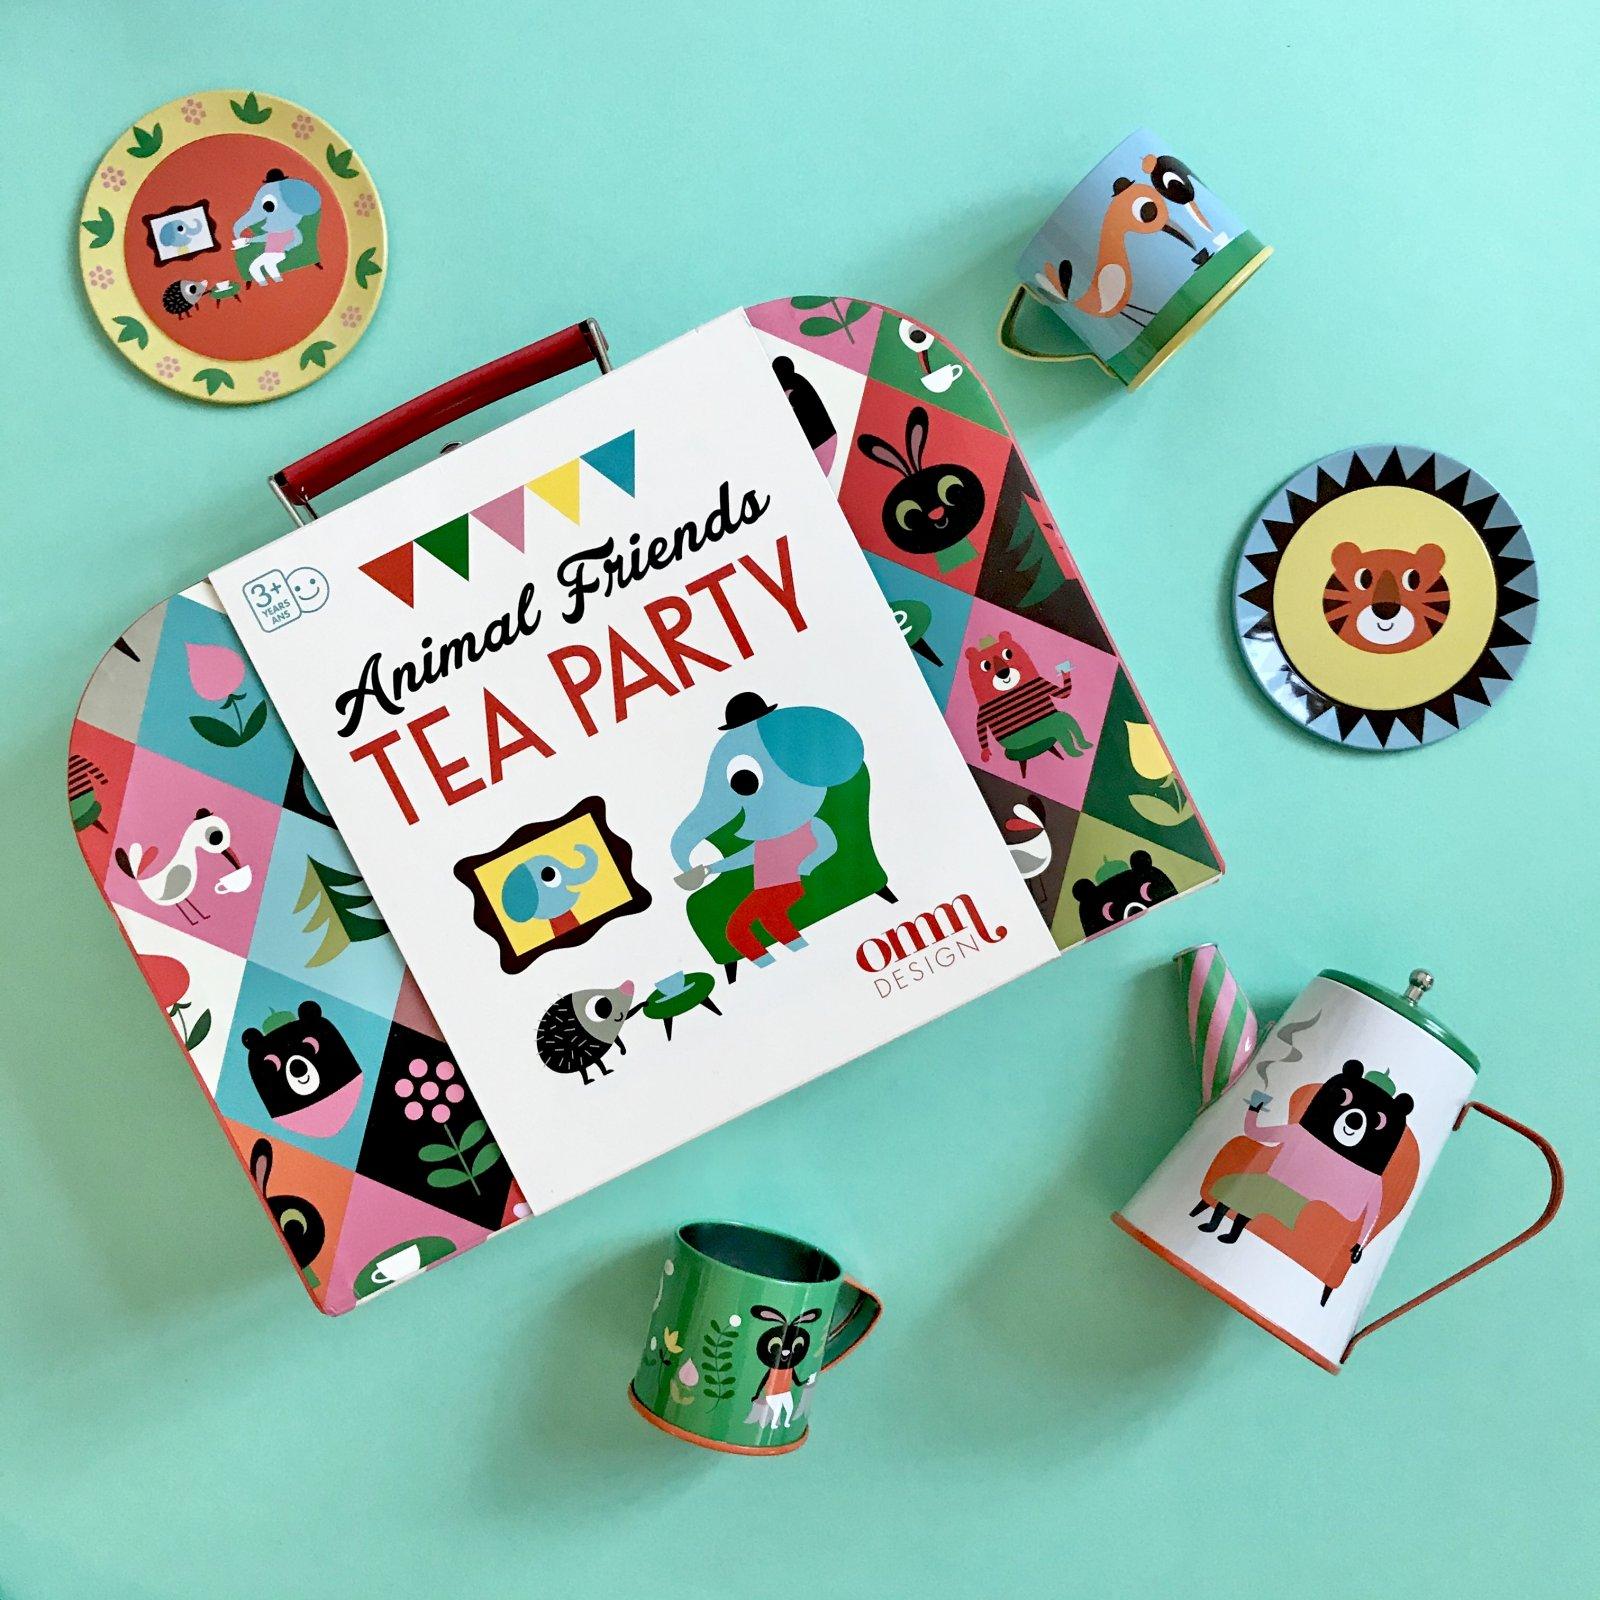 Animal Friends Tin Tea Set by OMM design